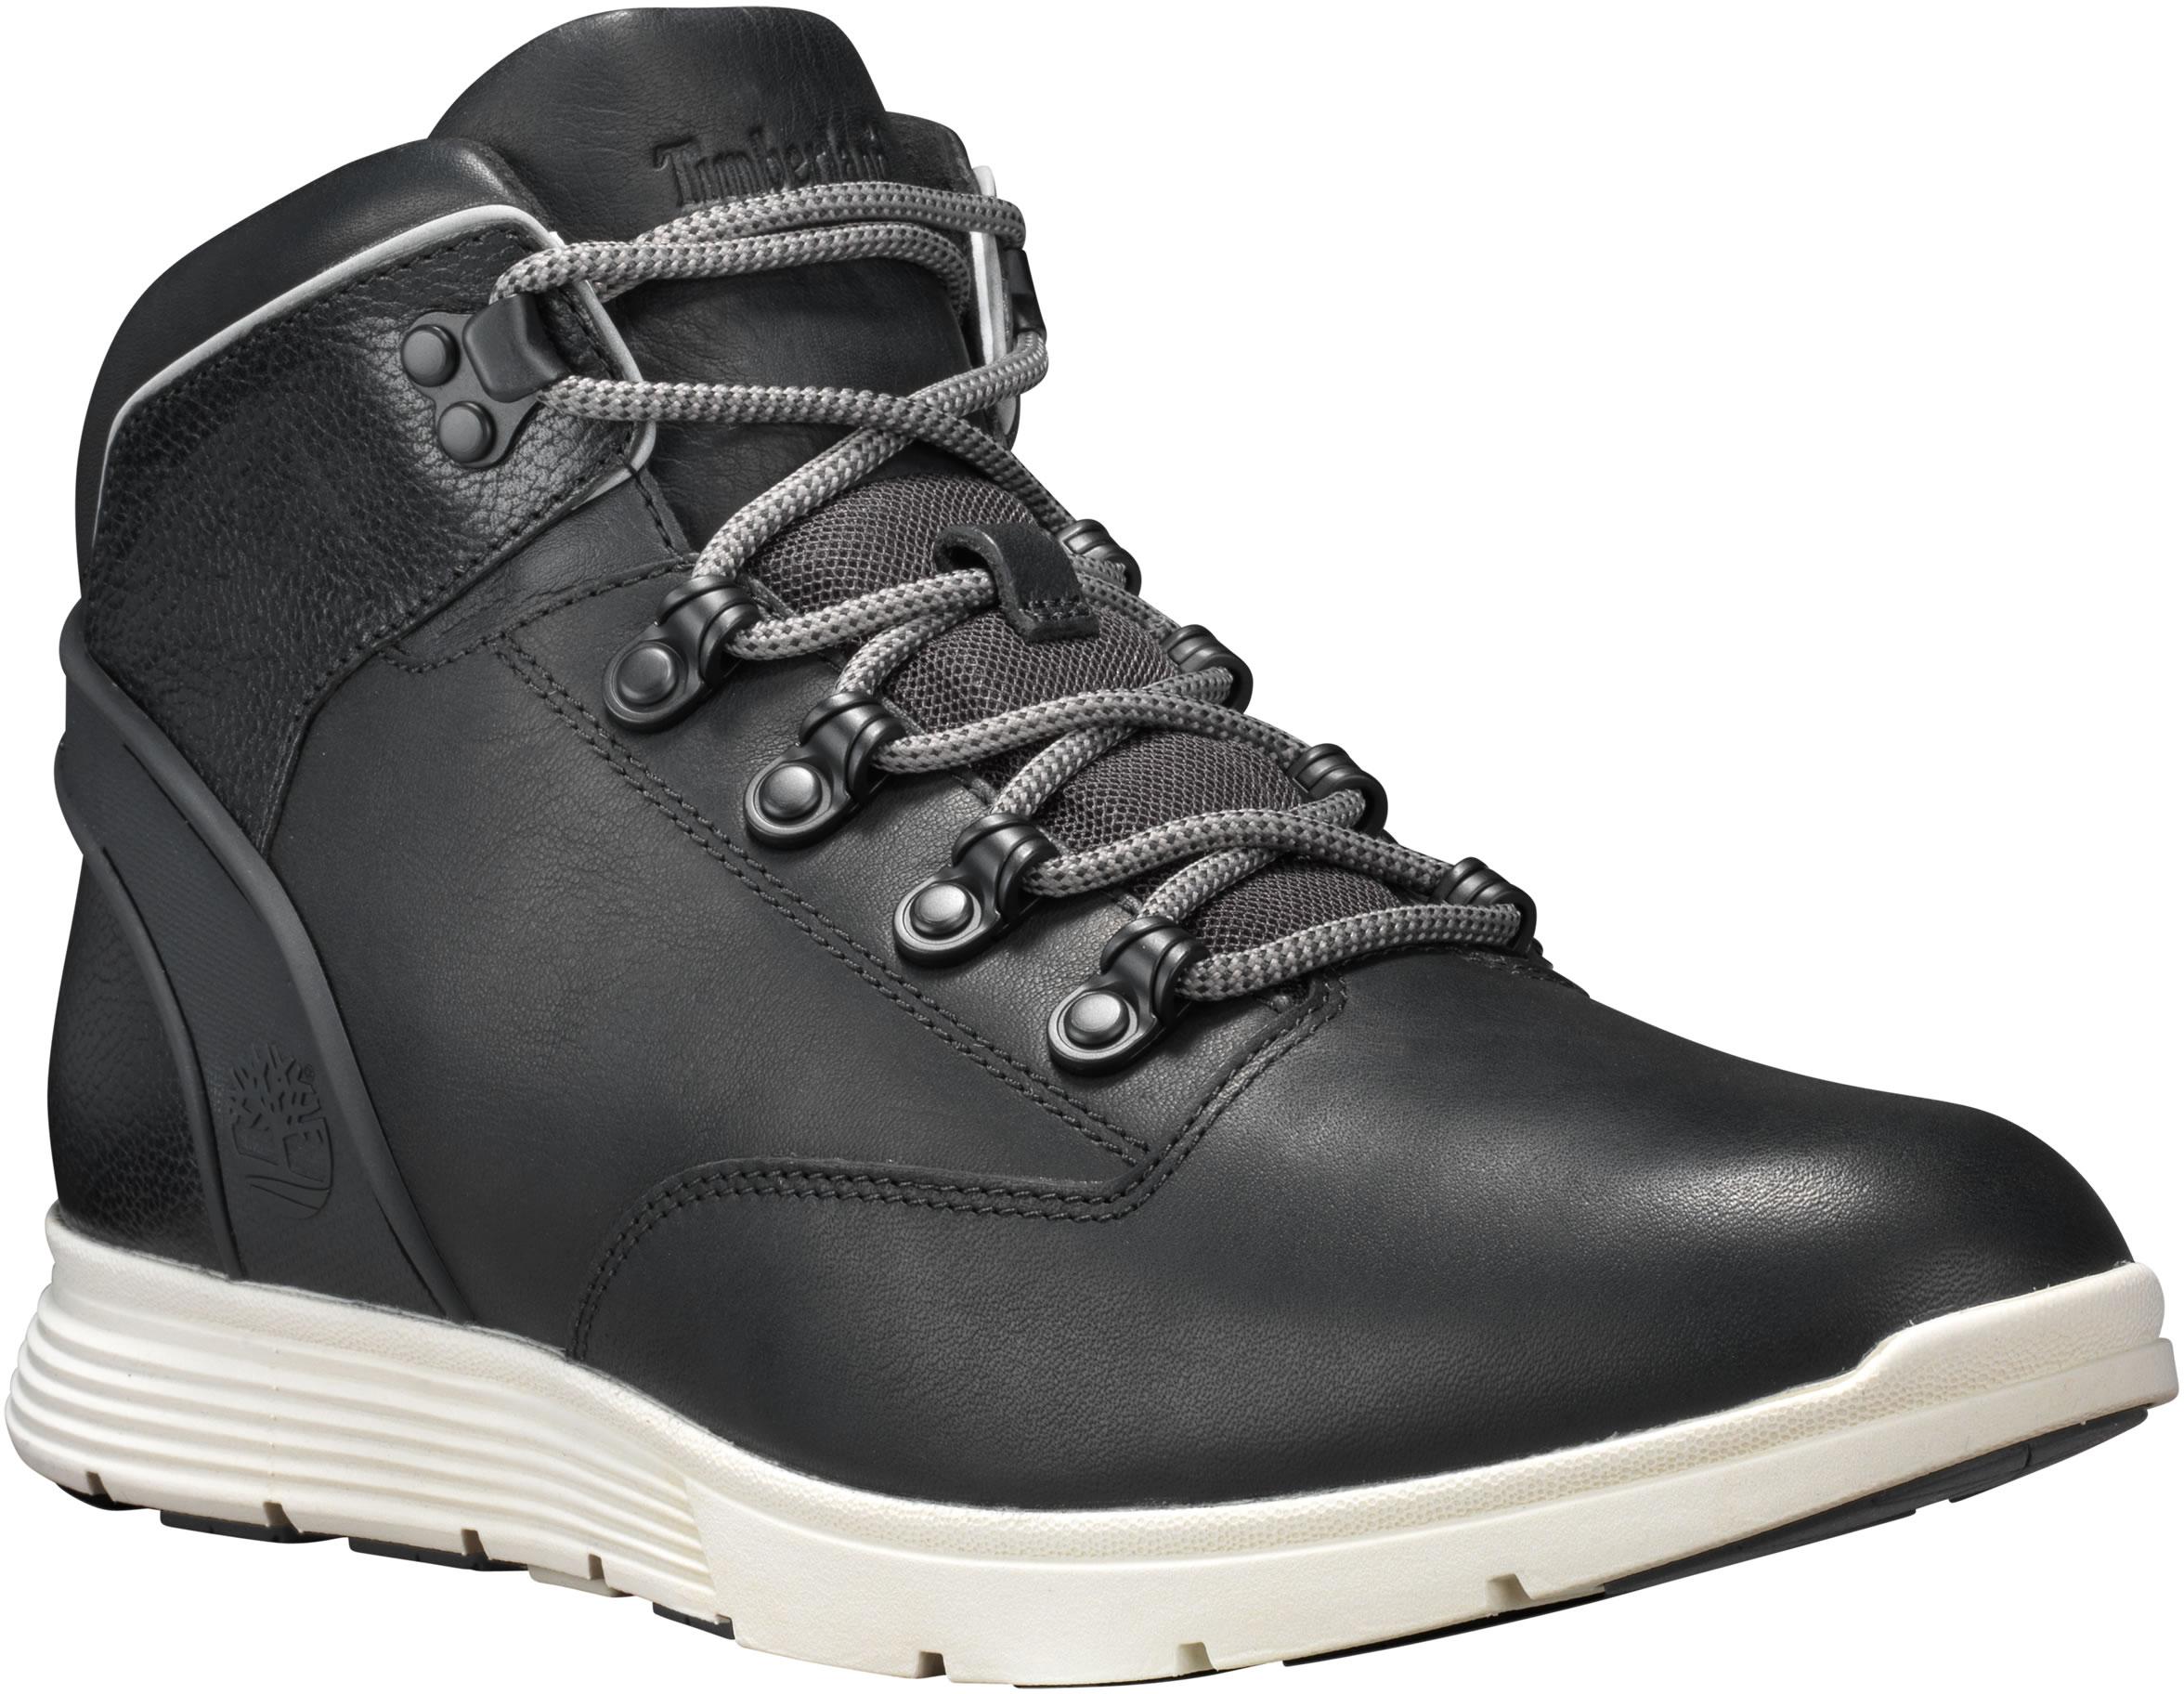 Timberland Killington Leather Hiker Boots - Men s 4d190eaedc43